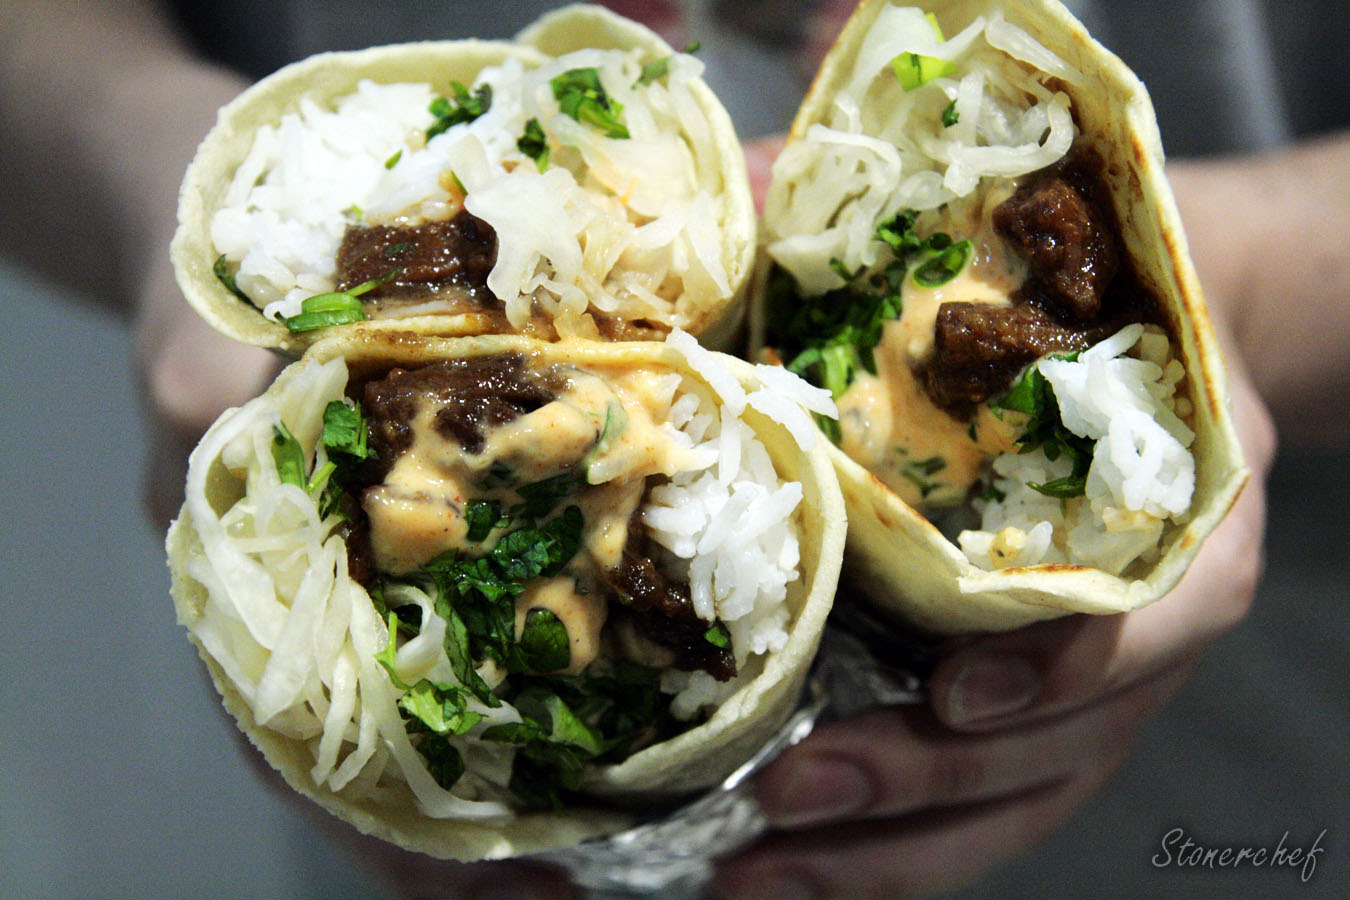 http://www.stonerchef.pl/wp-content/uploads/2017/01/zblizenie-na-dwa-koreanskie-burrito.jpg